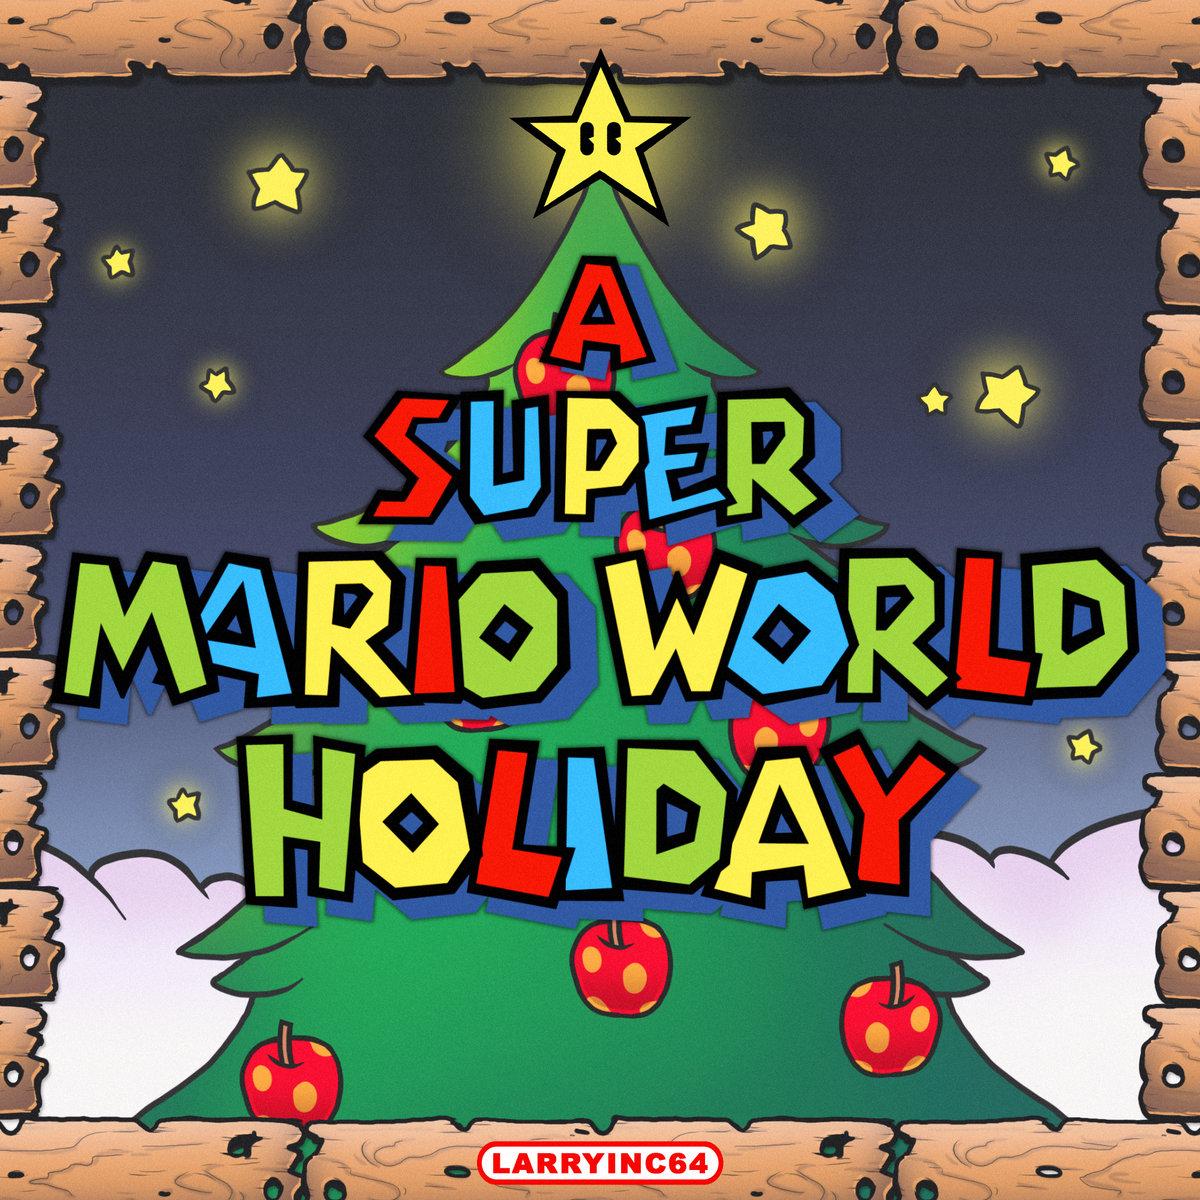 Super Mario World Christmas.A Super Mario World Holiday Larryinc64